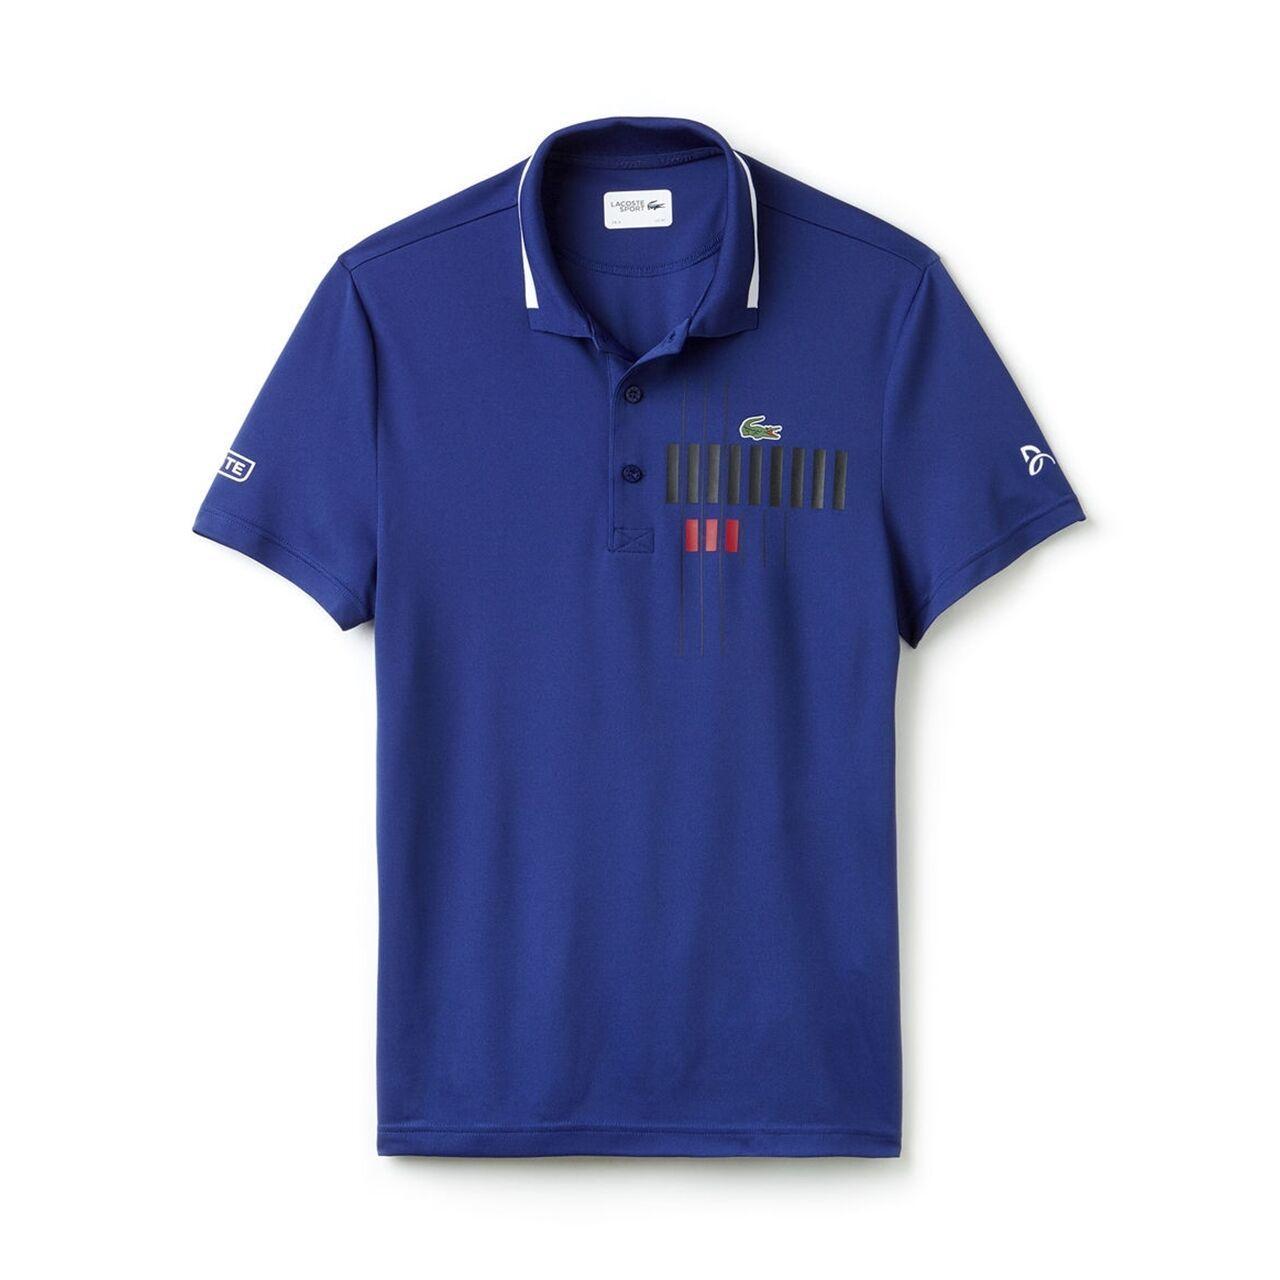 Lacoste Polo Novak Djokovic Collection Oceane/White Size XL M